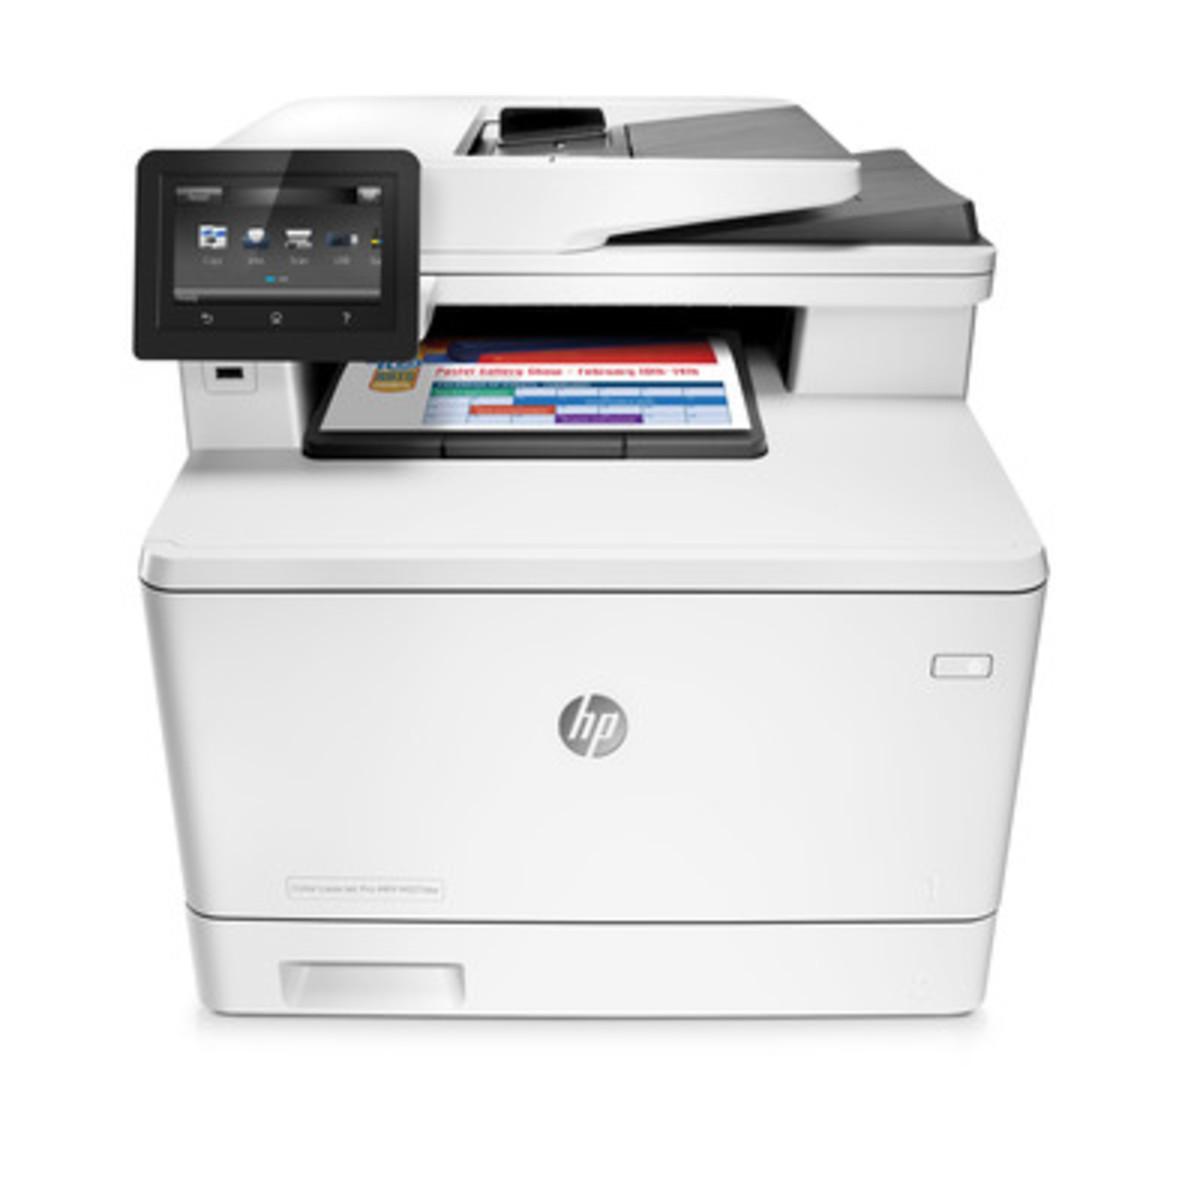 HP Color LaserJet Pro MFP M377dw Printer